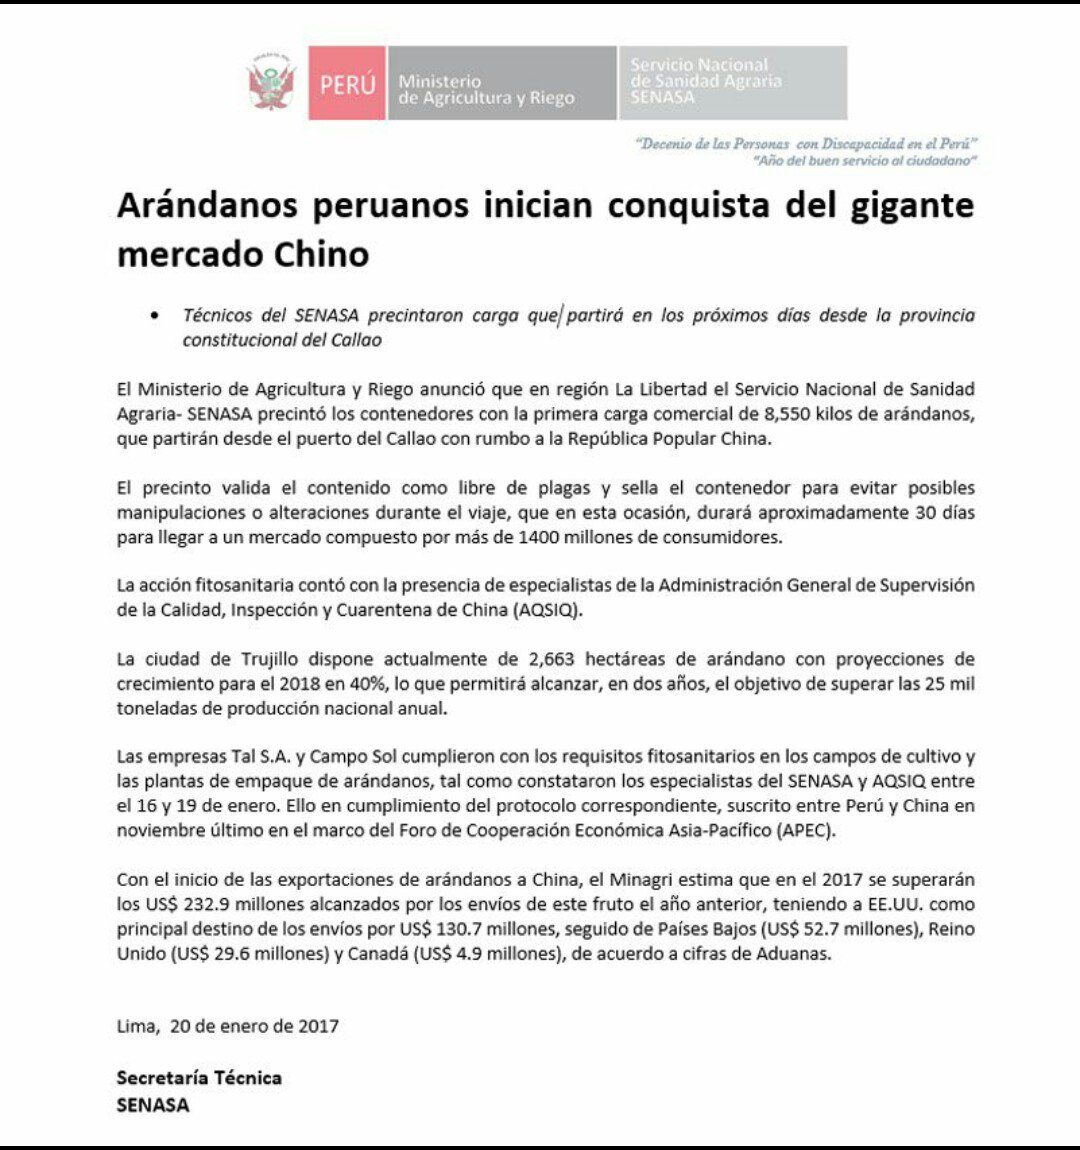 Senasa Peru على تويتر Loultimo Arandanos Peruanos Inician